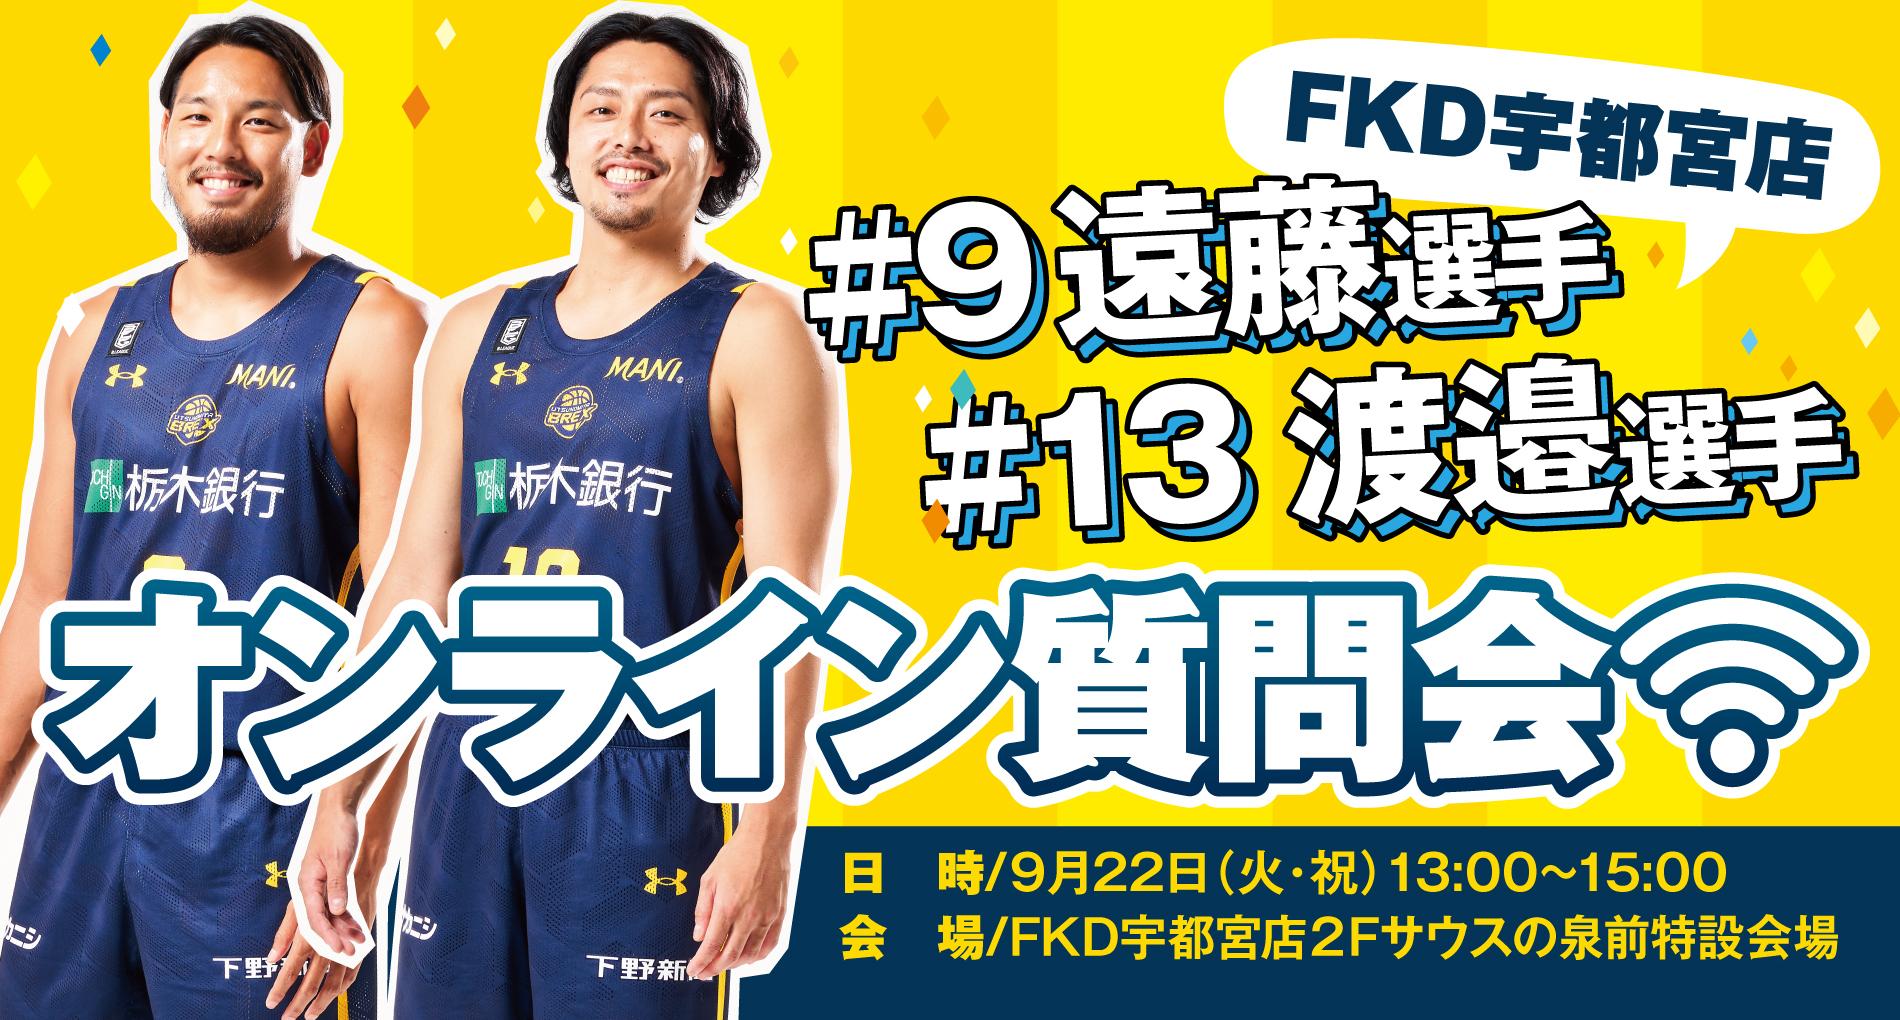 FKD宇都宮イベント